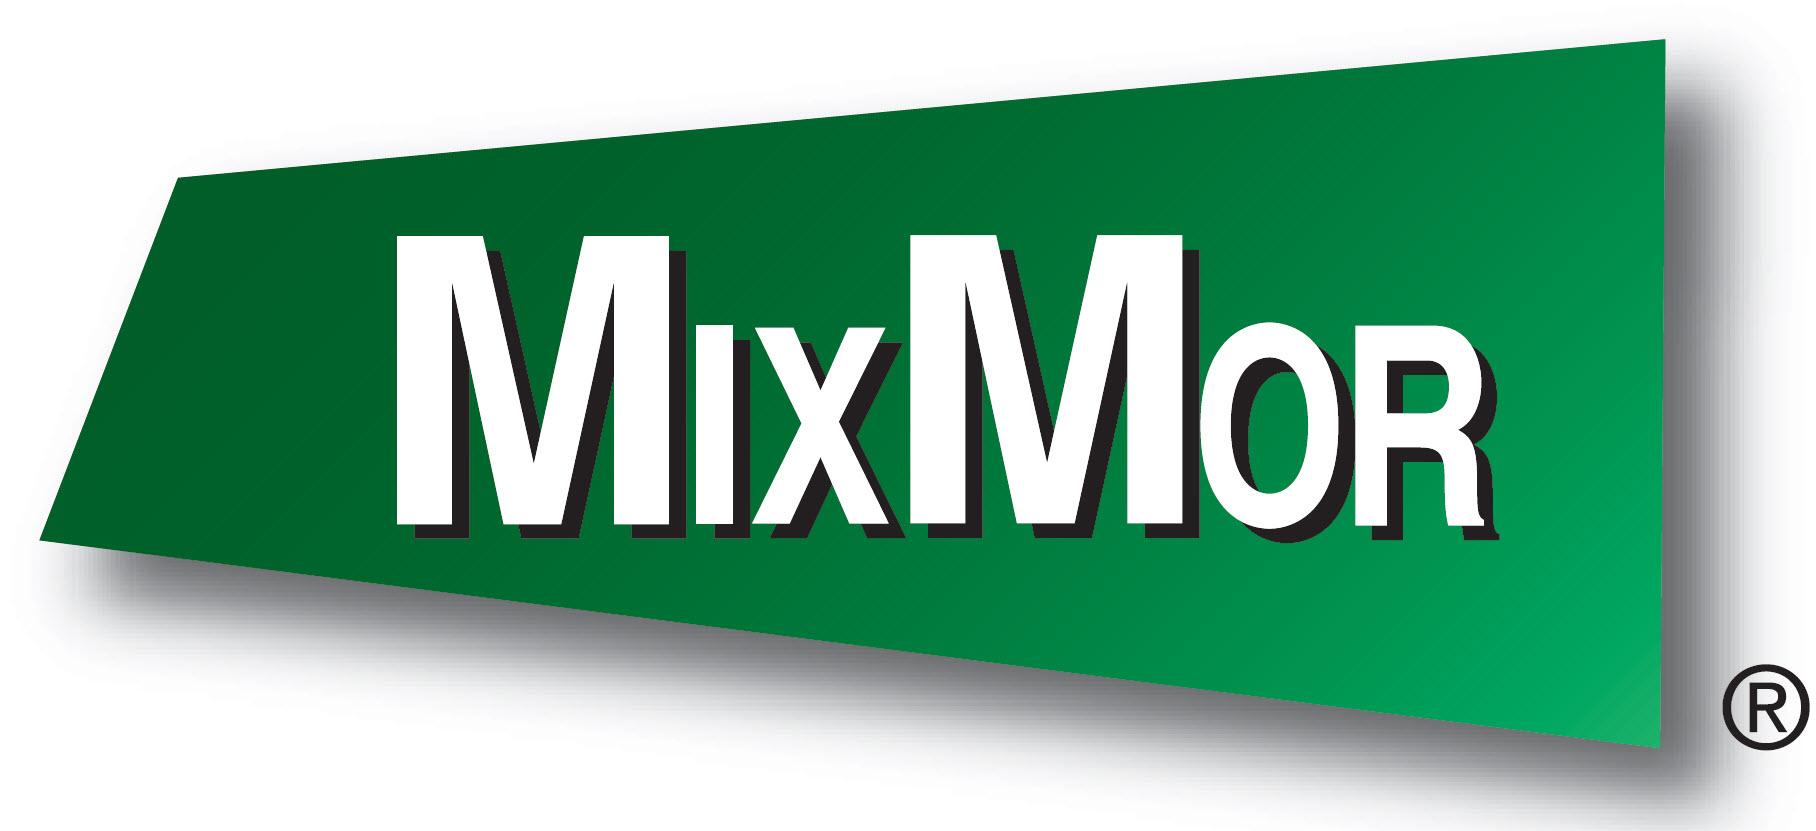 MixMor-logo.jpg